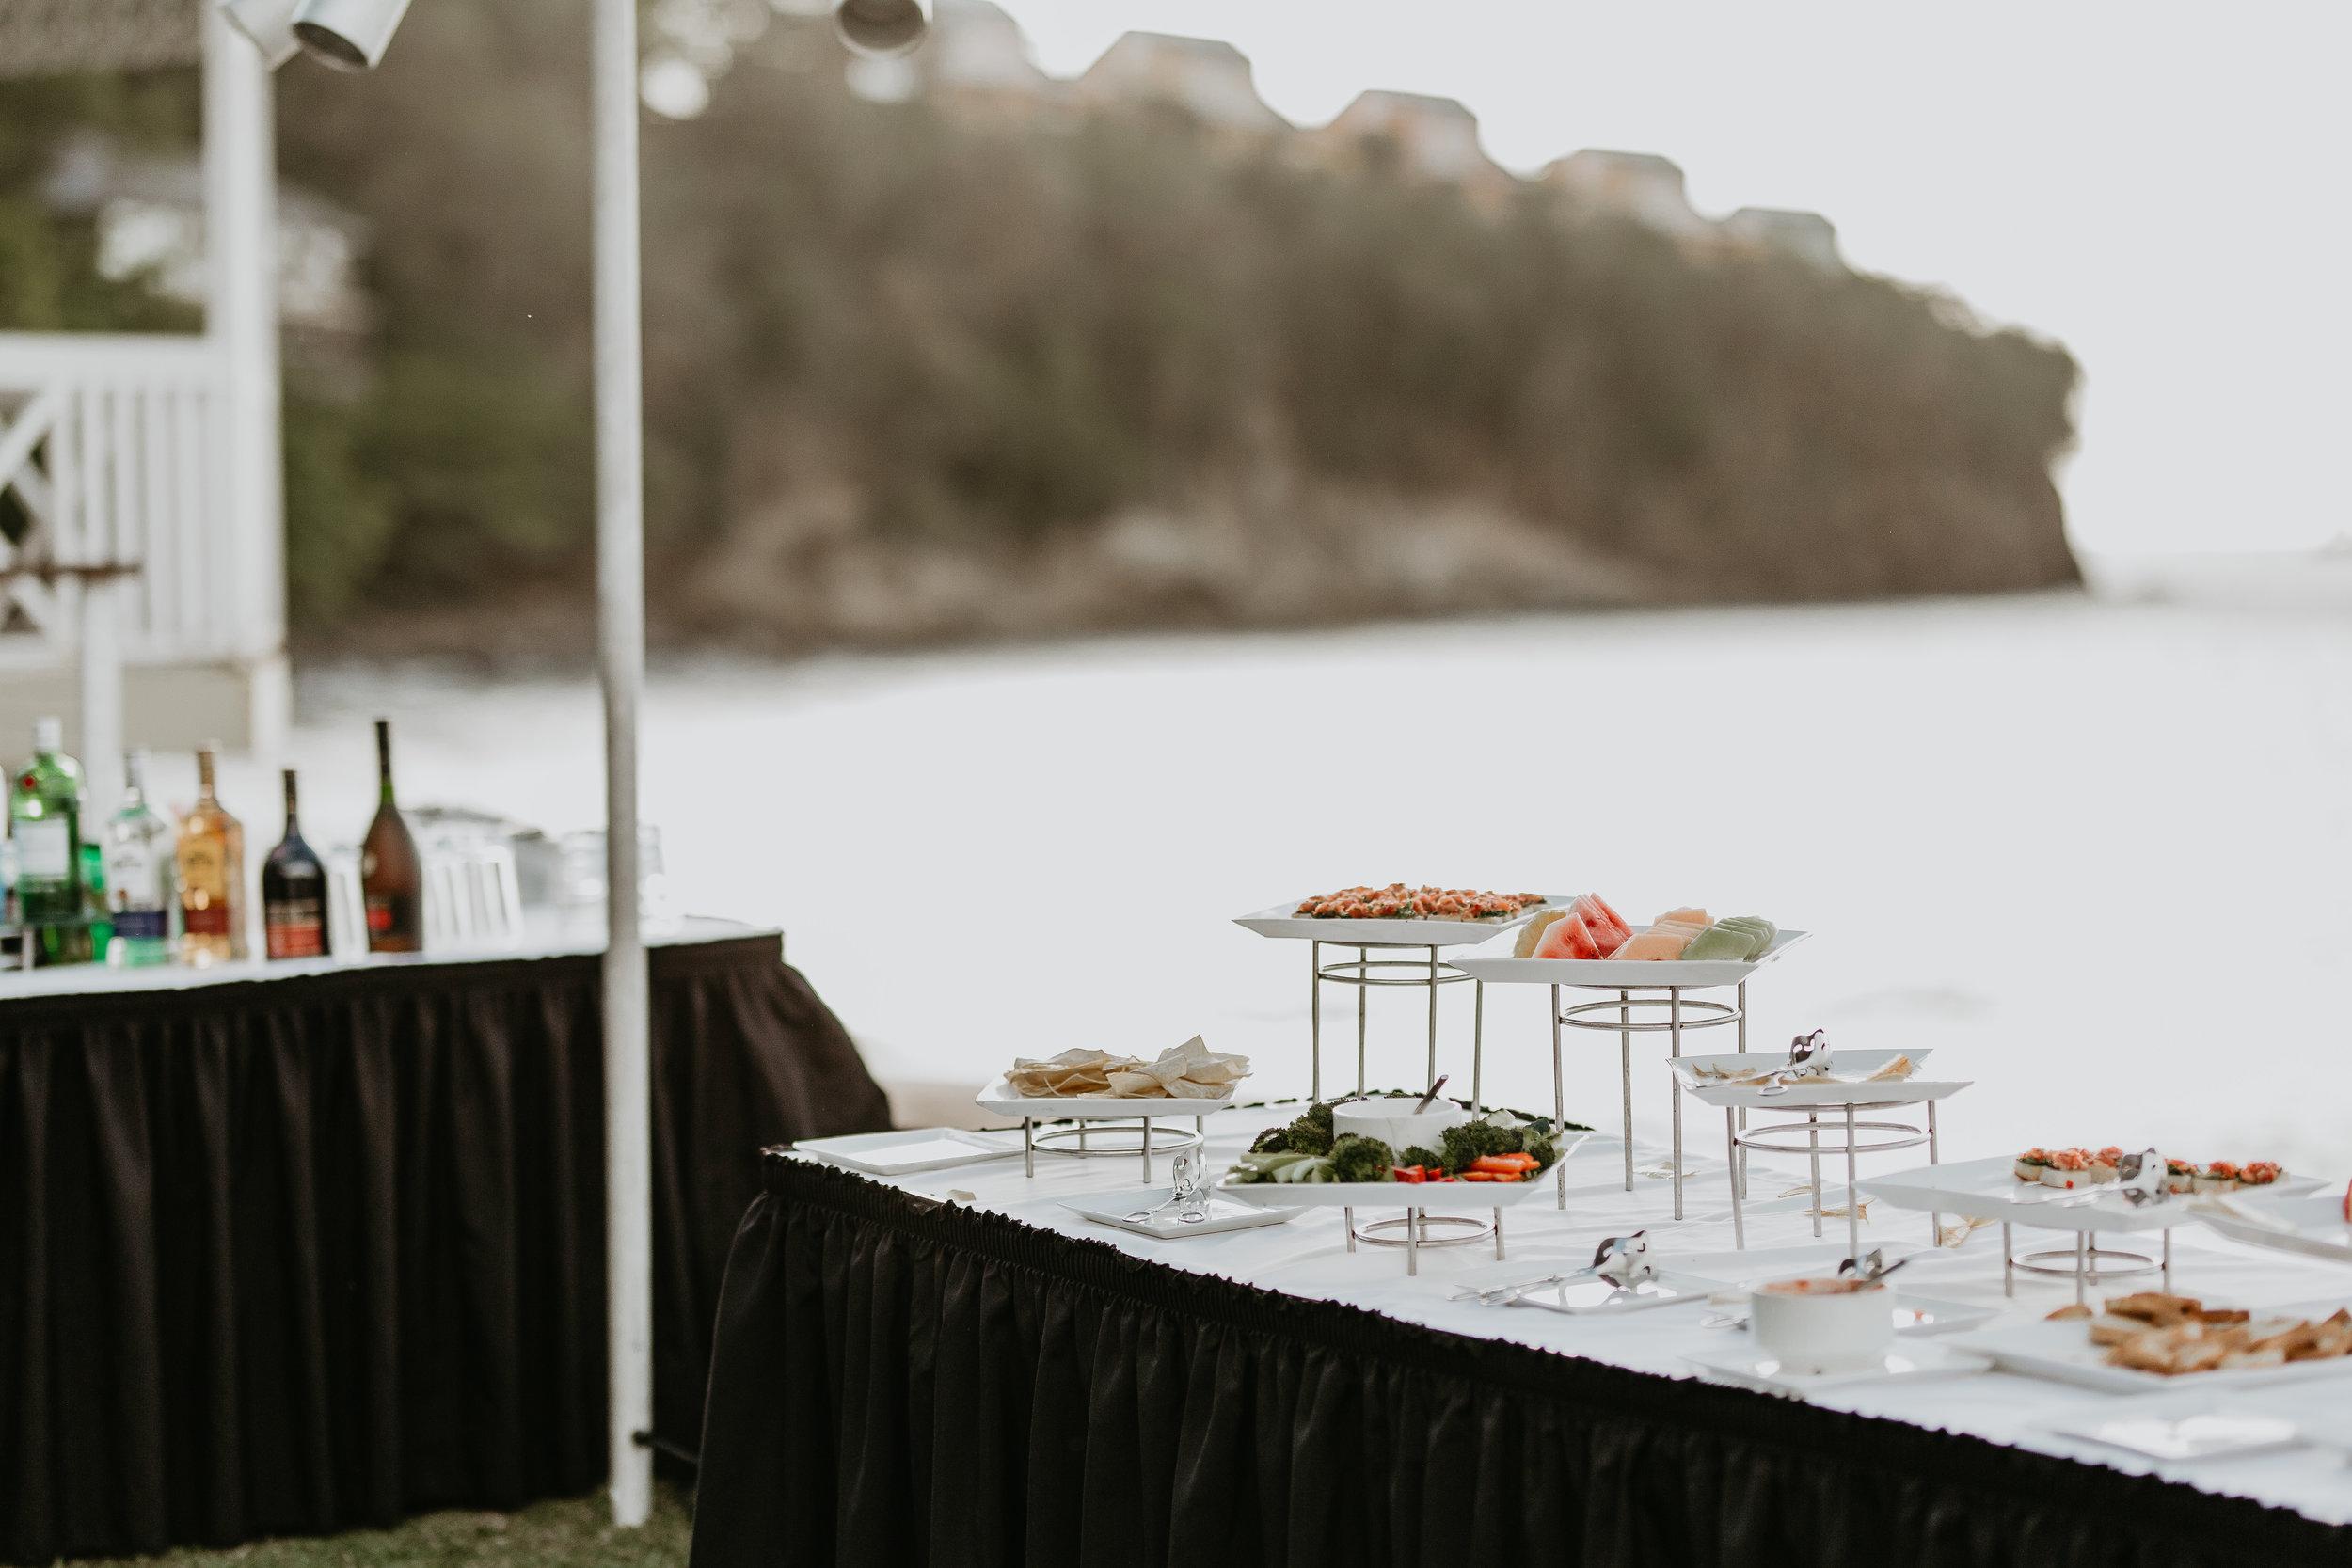 nicole-daacke-photography-destination-wedding-in-st-lucia-sandals-la-toc-intimate-island-wedding-carribean-elopement-photographer-chill-island-wedding-103.jpg